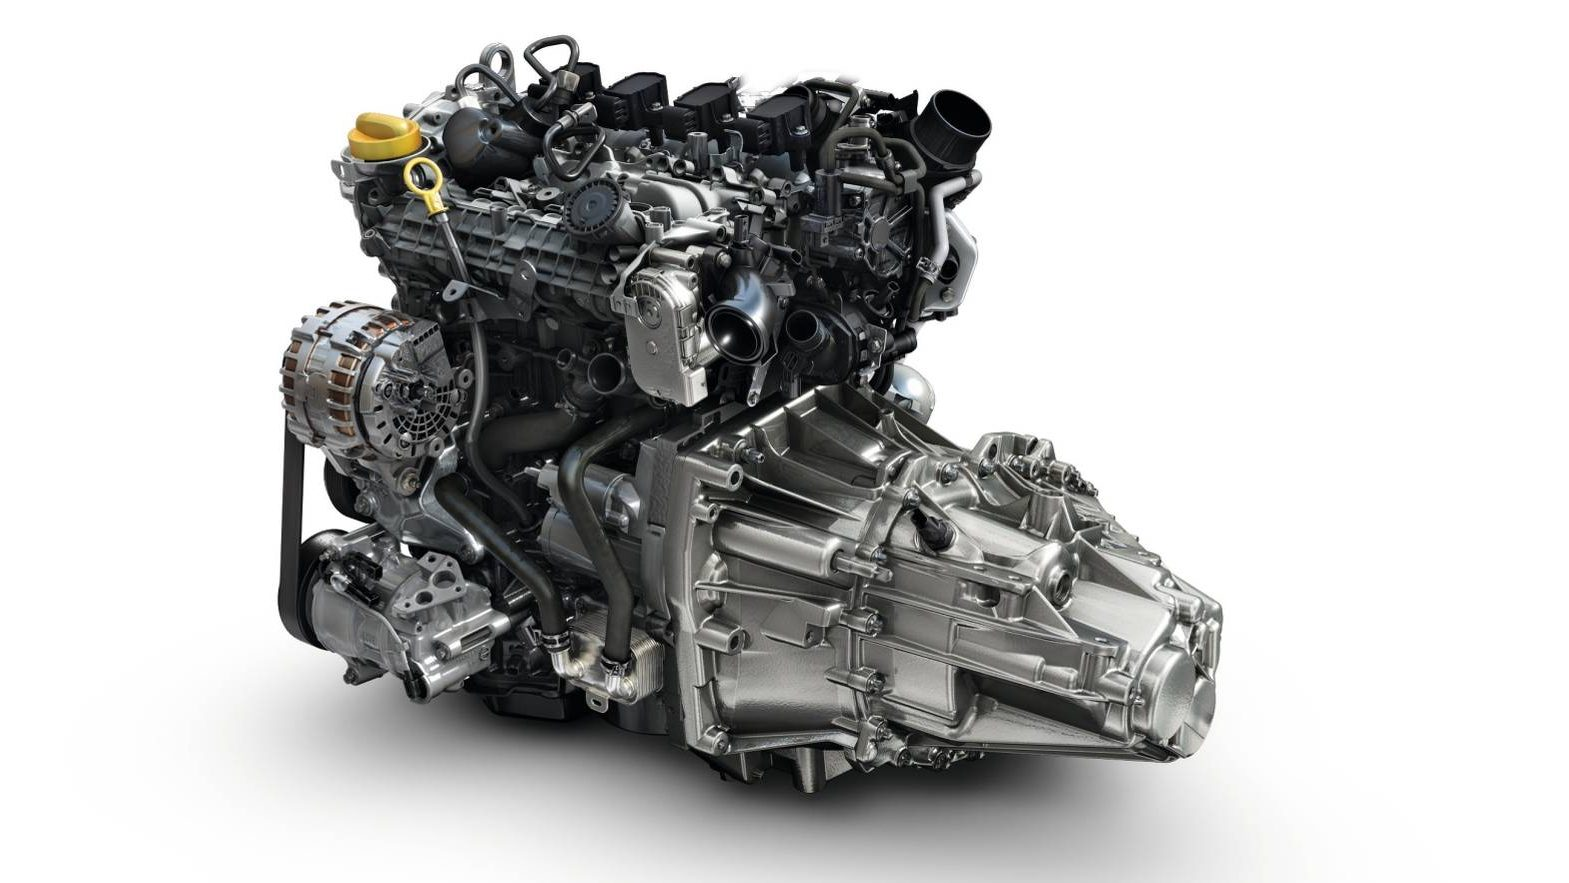 Novo motor 1.3 turboflex renault captur 2022